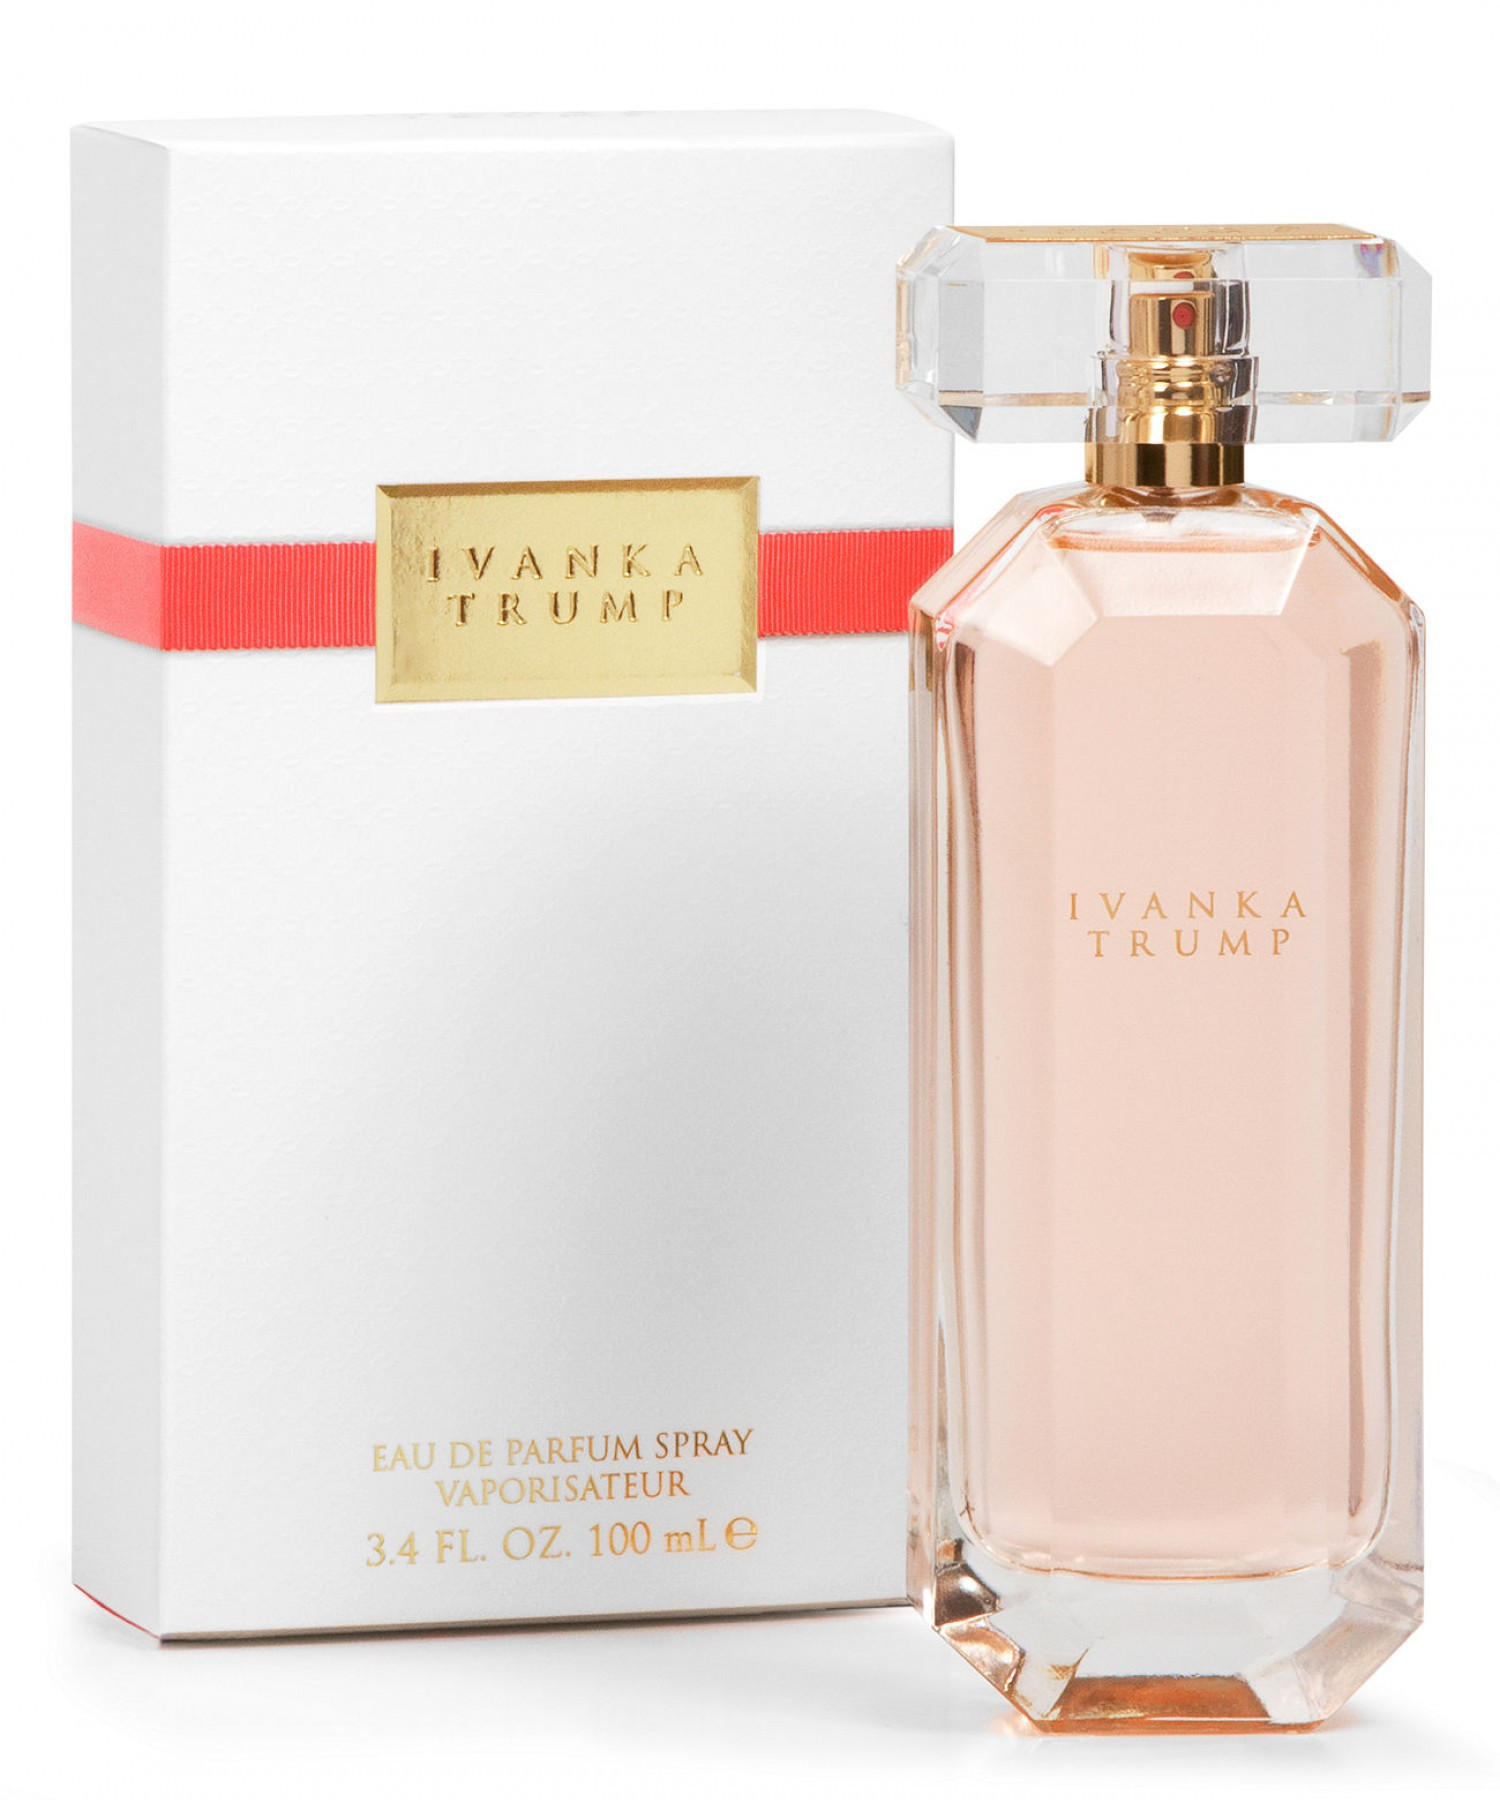 Ivanka Trump аромат для женщин